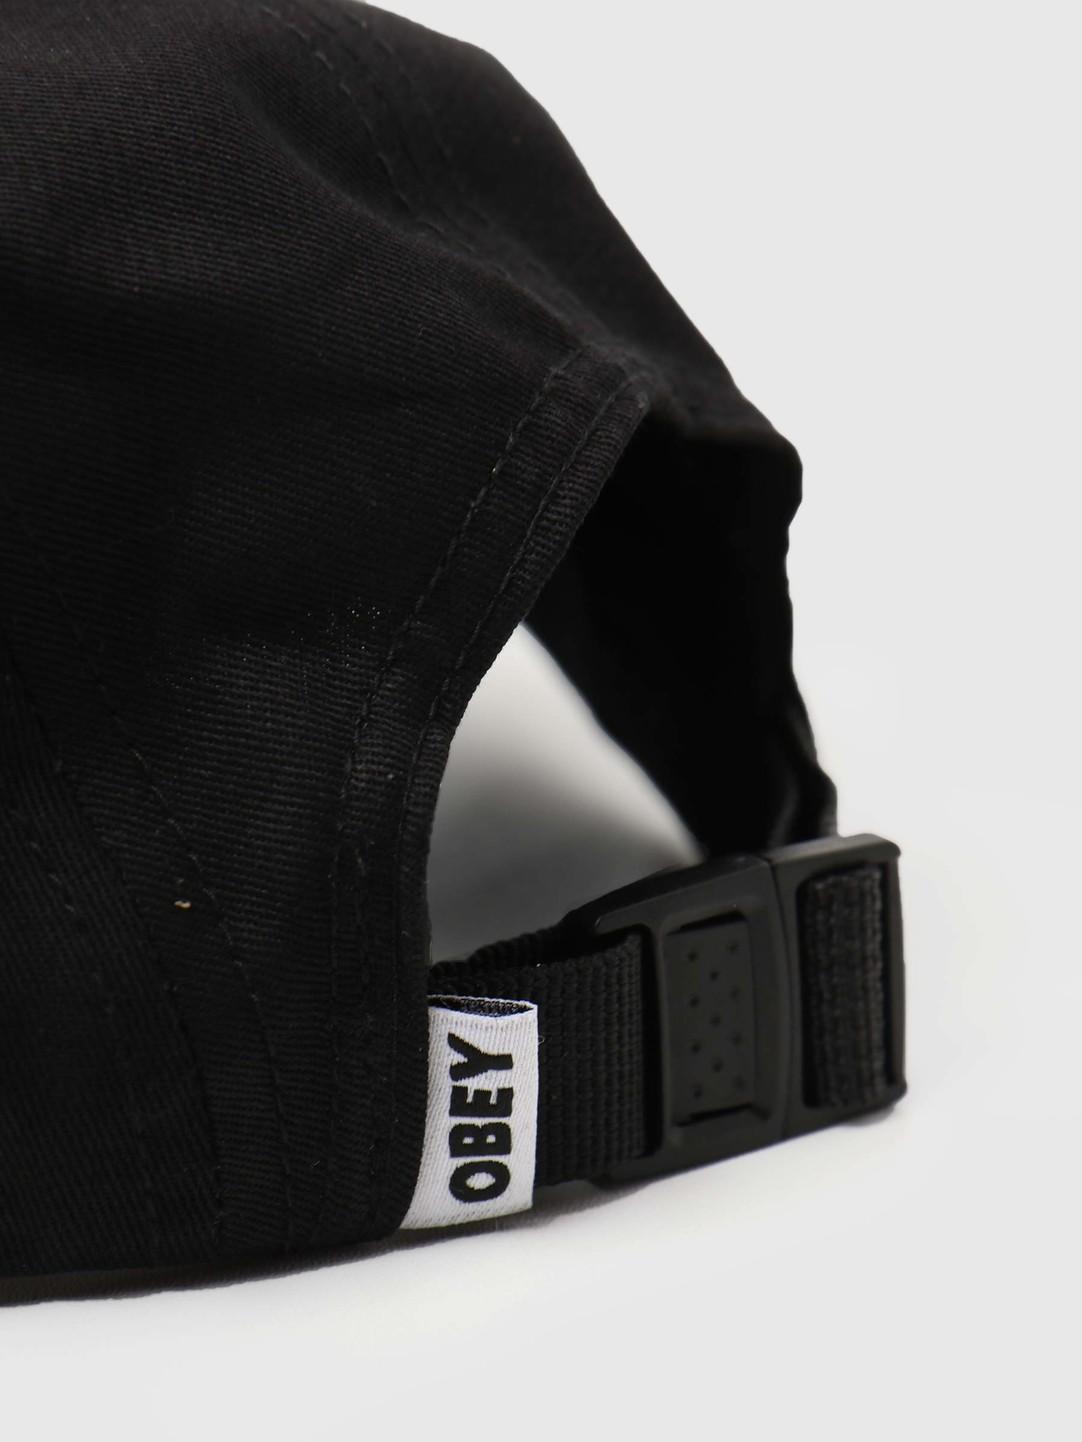 Obey Obey Eyes 5 Panel Hat Black 100490059-BLK